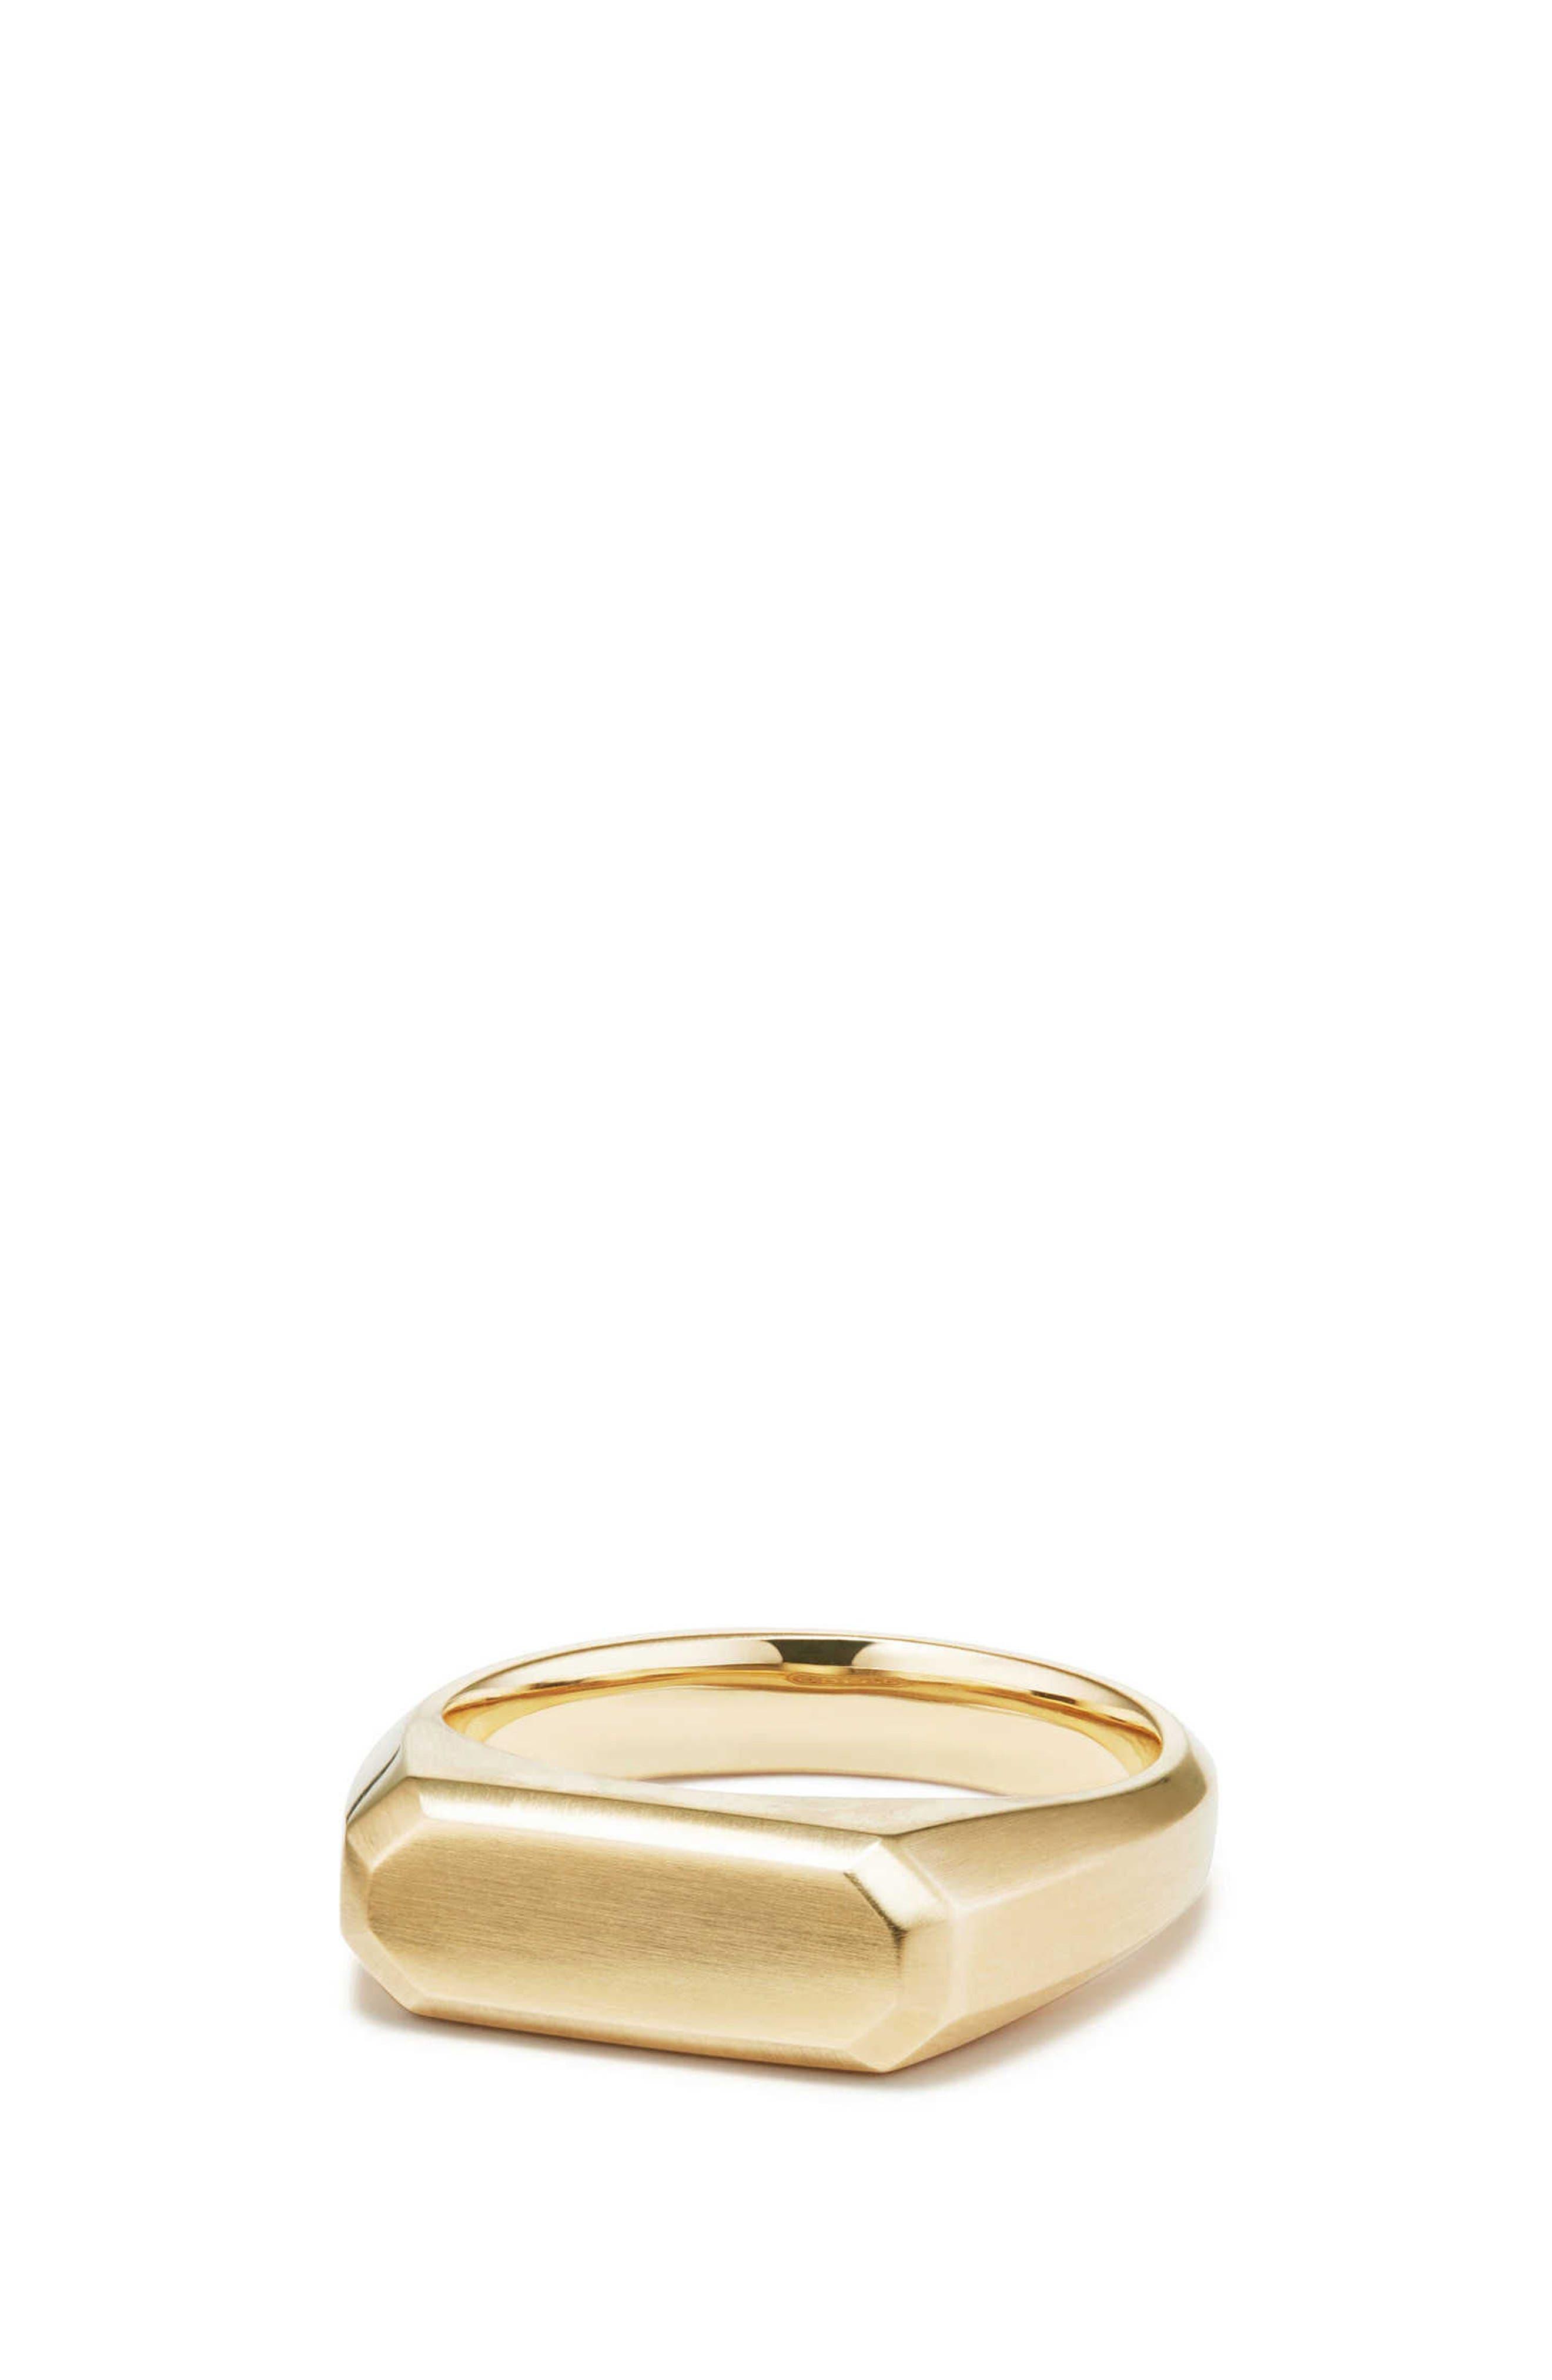 Alternate Image 1 Selected - David Yurman Streamline Signet Ring in 18K Gold